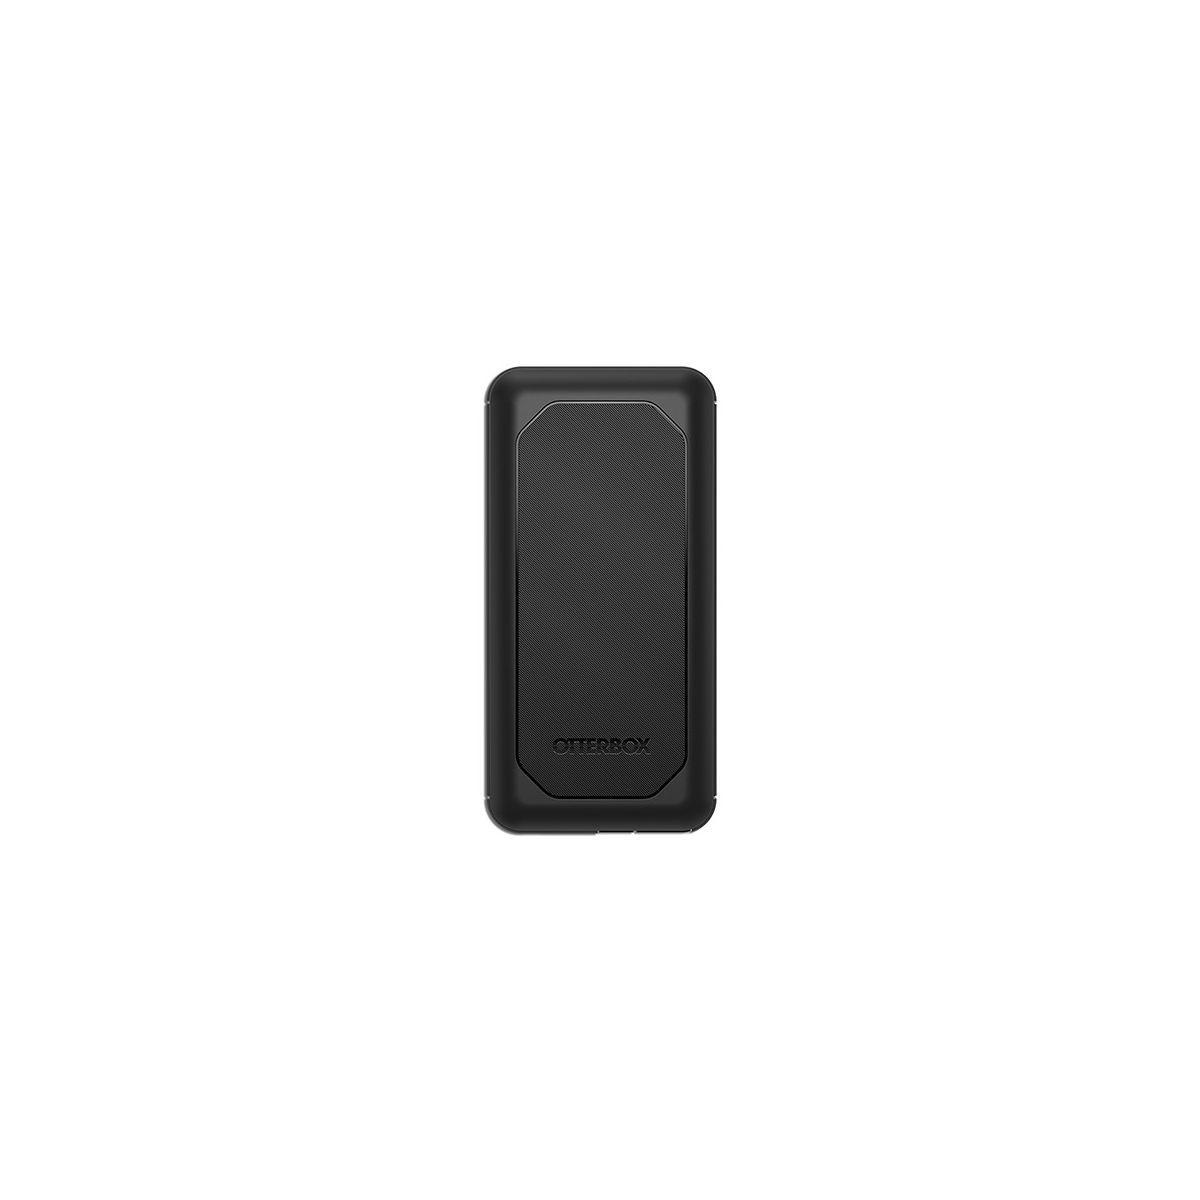 Batterie externe otterbox otterbox power pack 10 000 mahr - livraison offerte : code premium (photo)